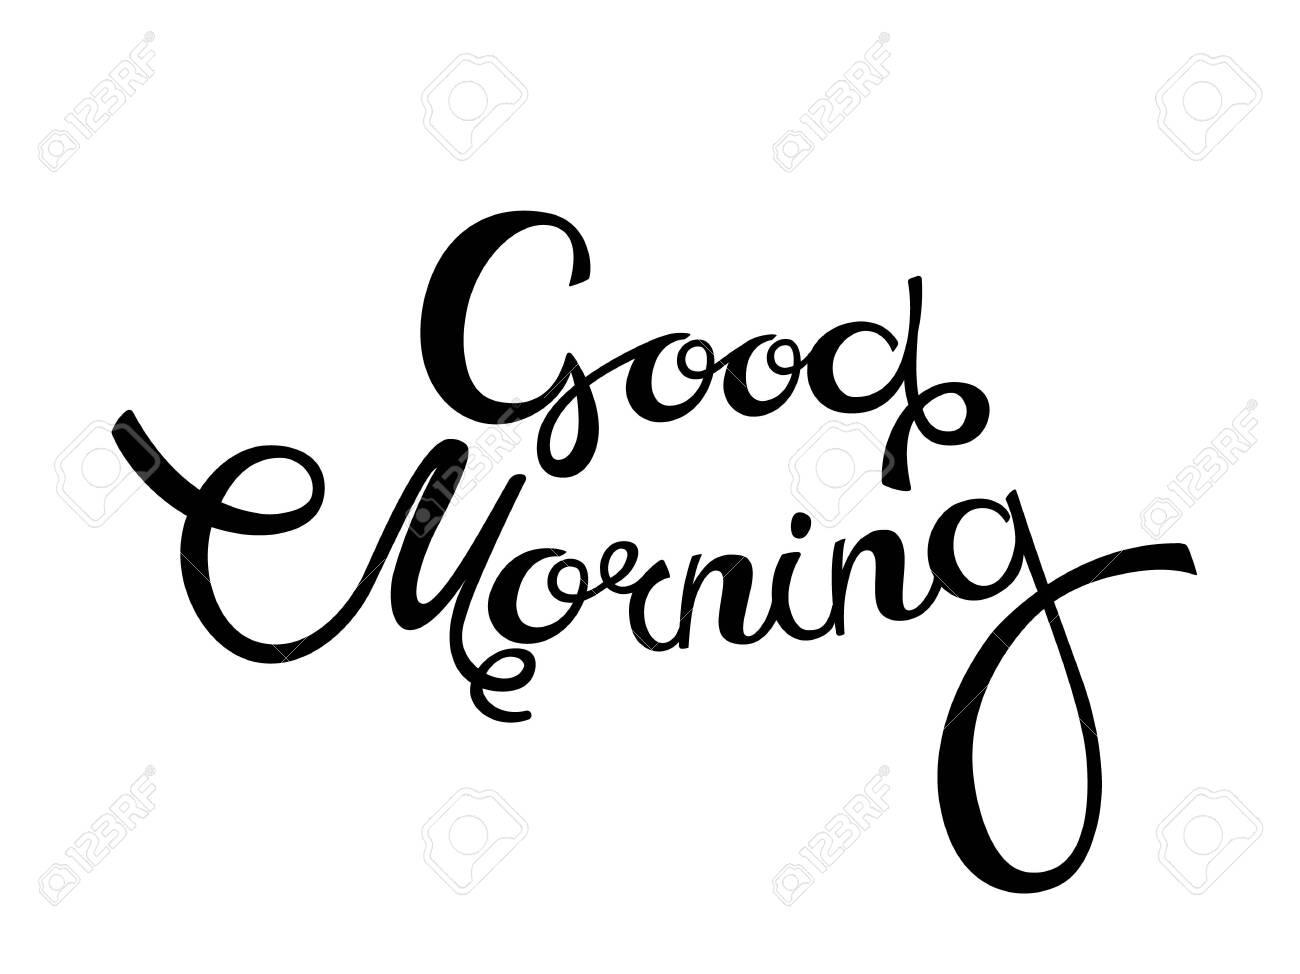 Good morning, hand lettering text, handmade calligraphy, Vector illustration - 147341197